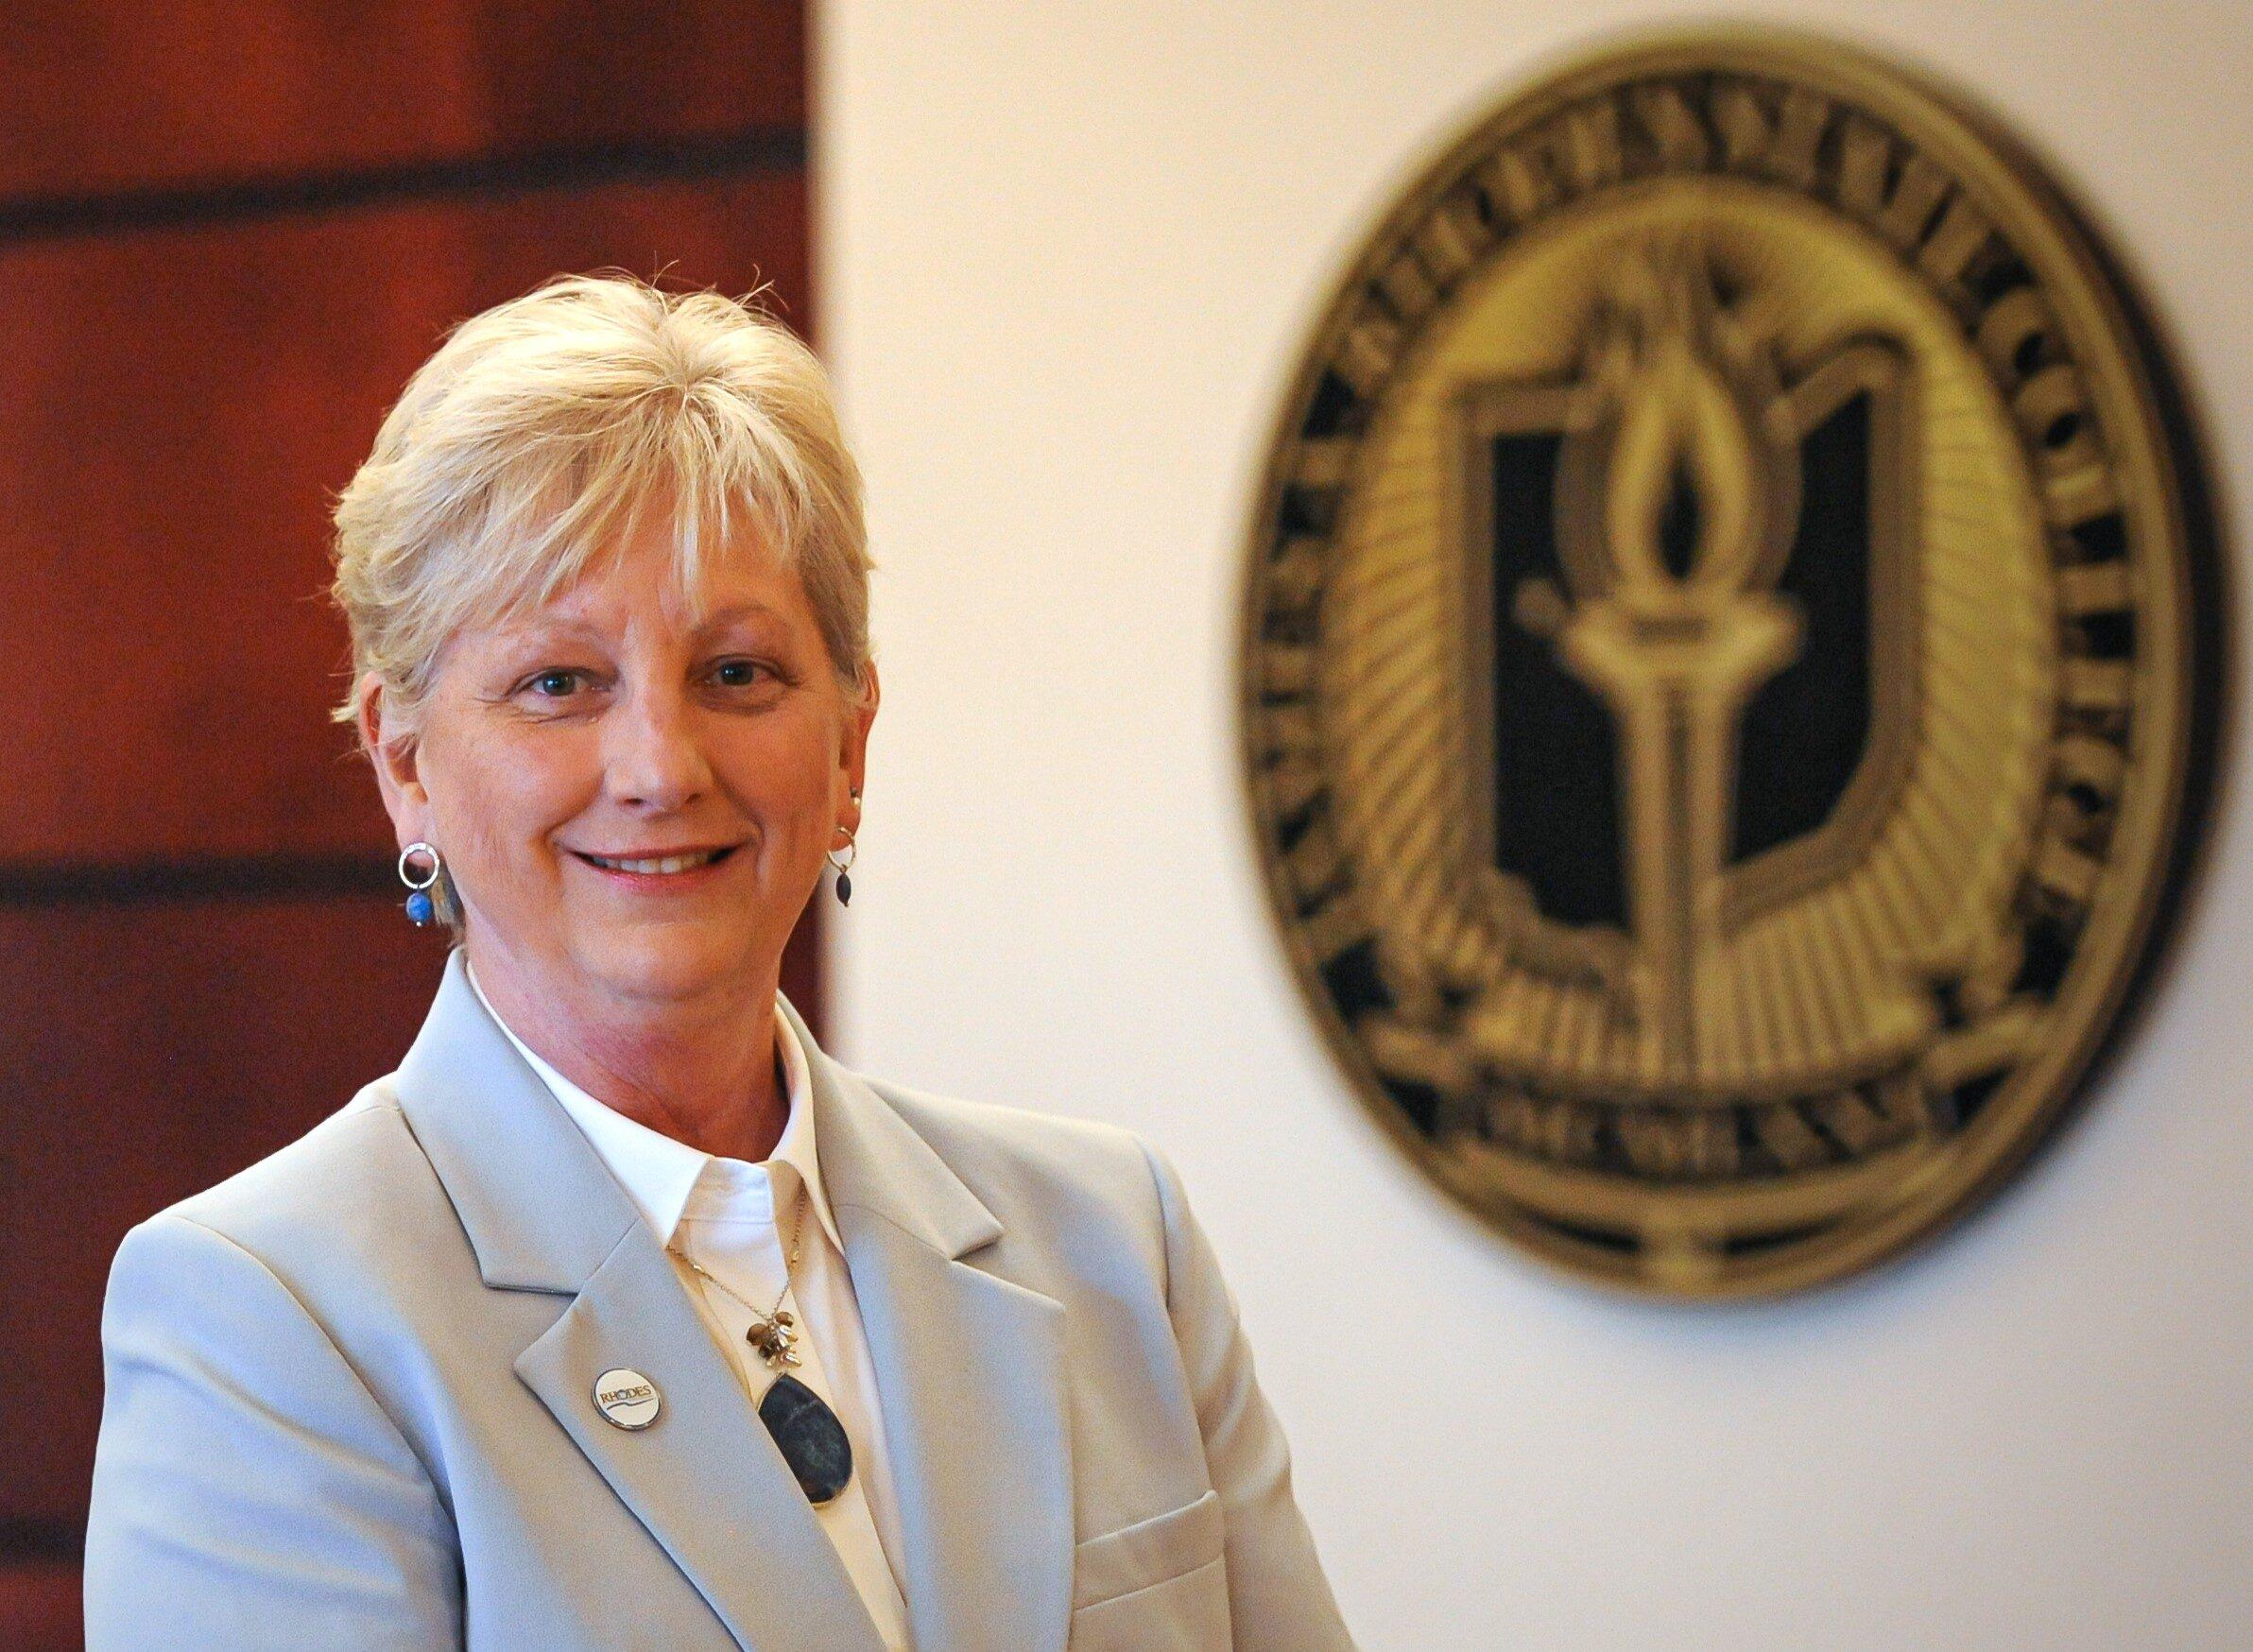 Dr.-Cynthia-Spiers-Ohio-BSN-Degrees